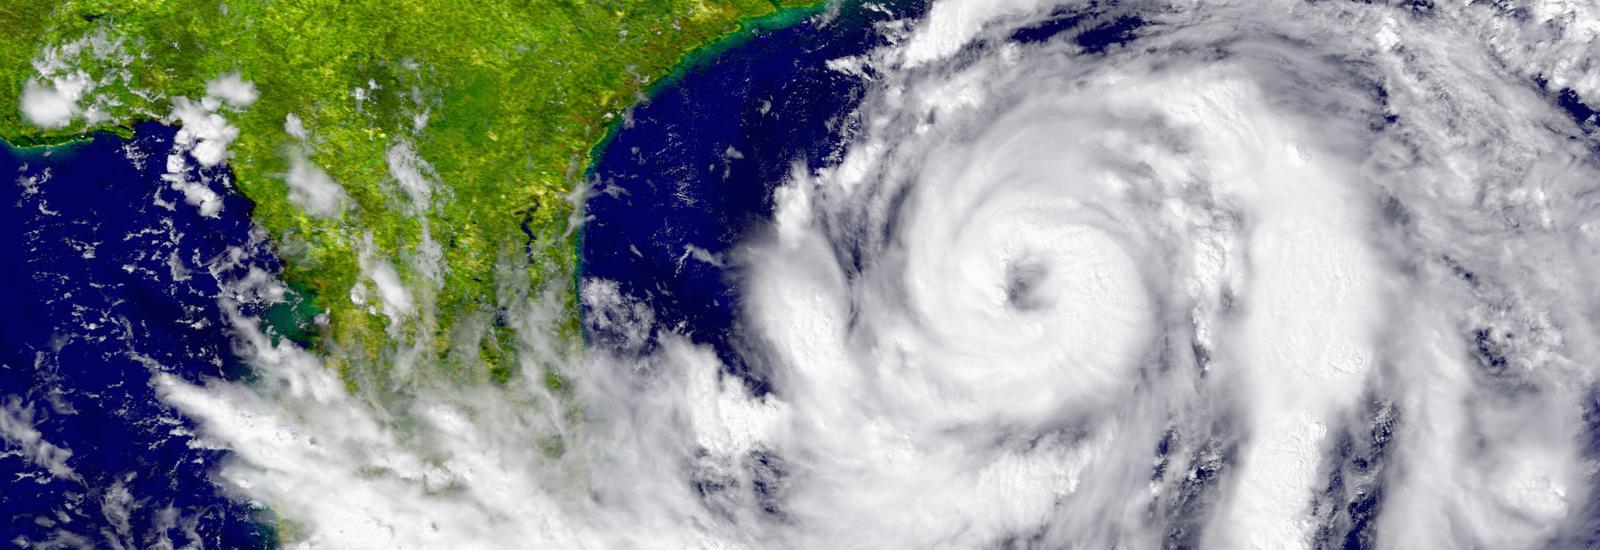 Worst-Case Scenario: Resilient Design Weathers the Storm